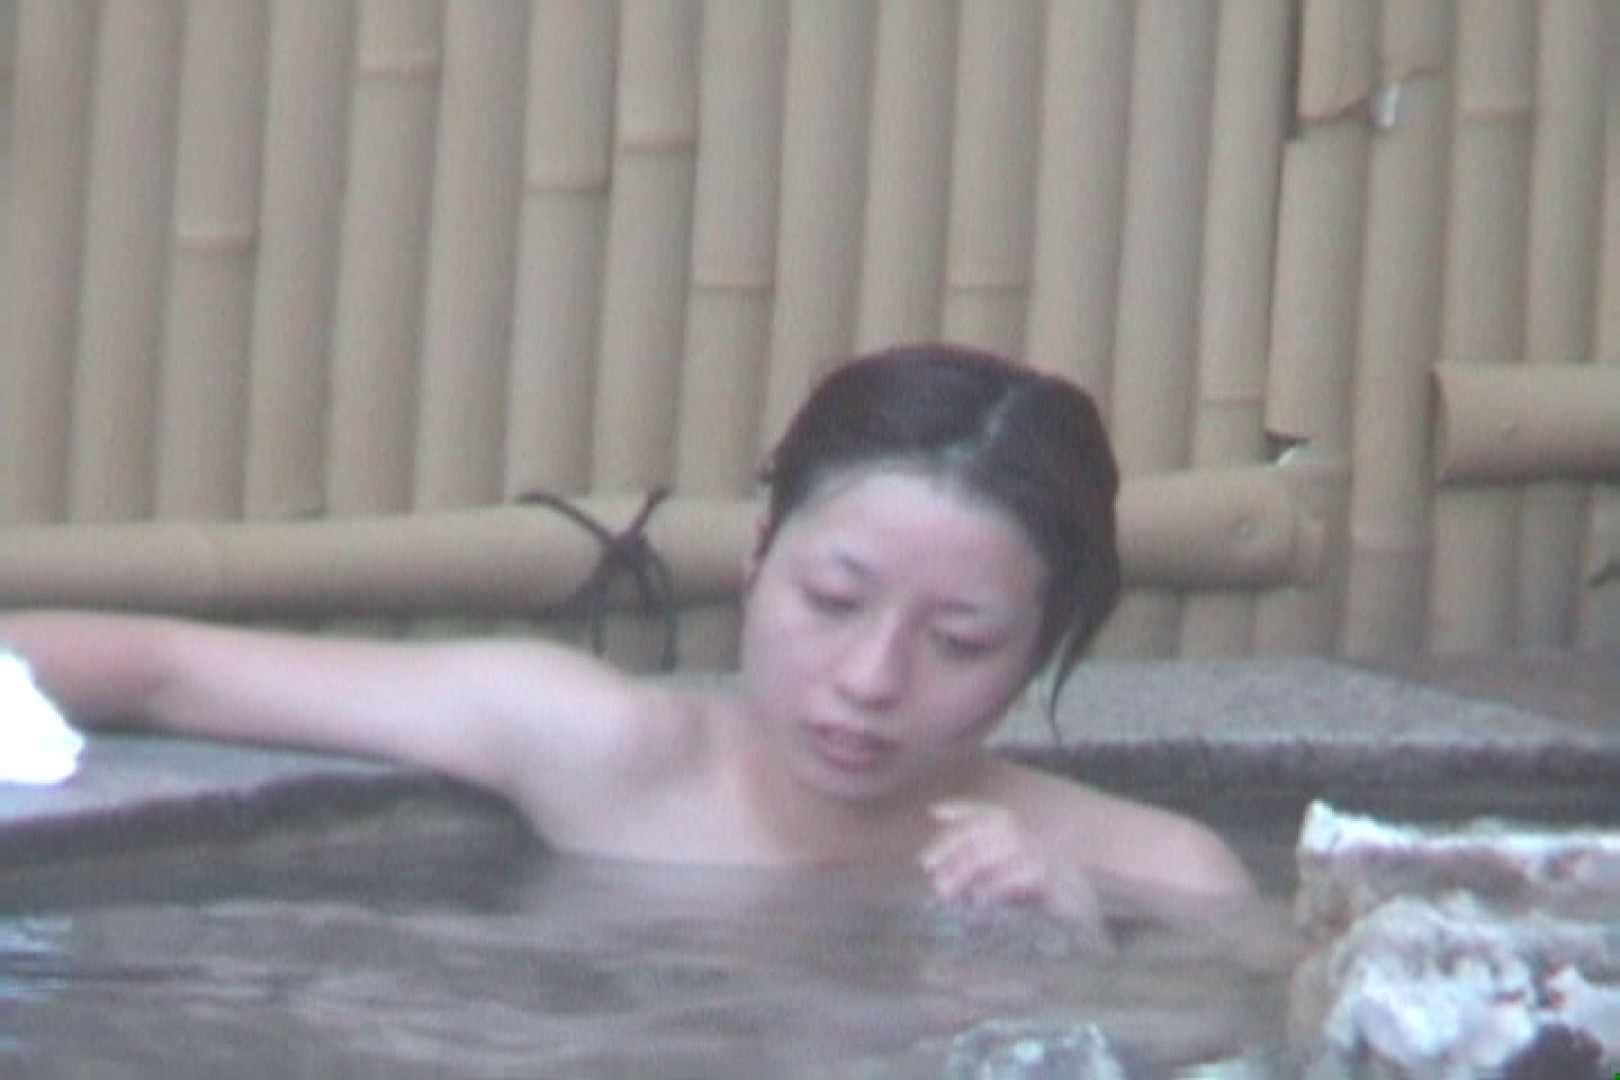 Aquaな露天風呂Vol.608 HなOL | 盗撮  89pic 63